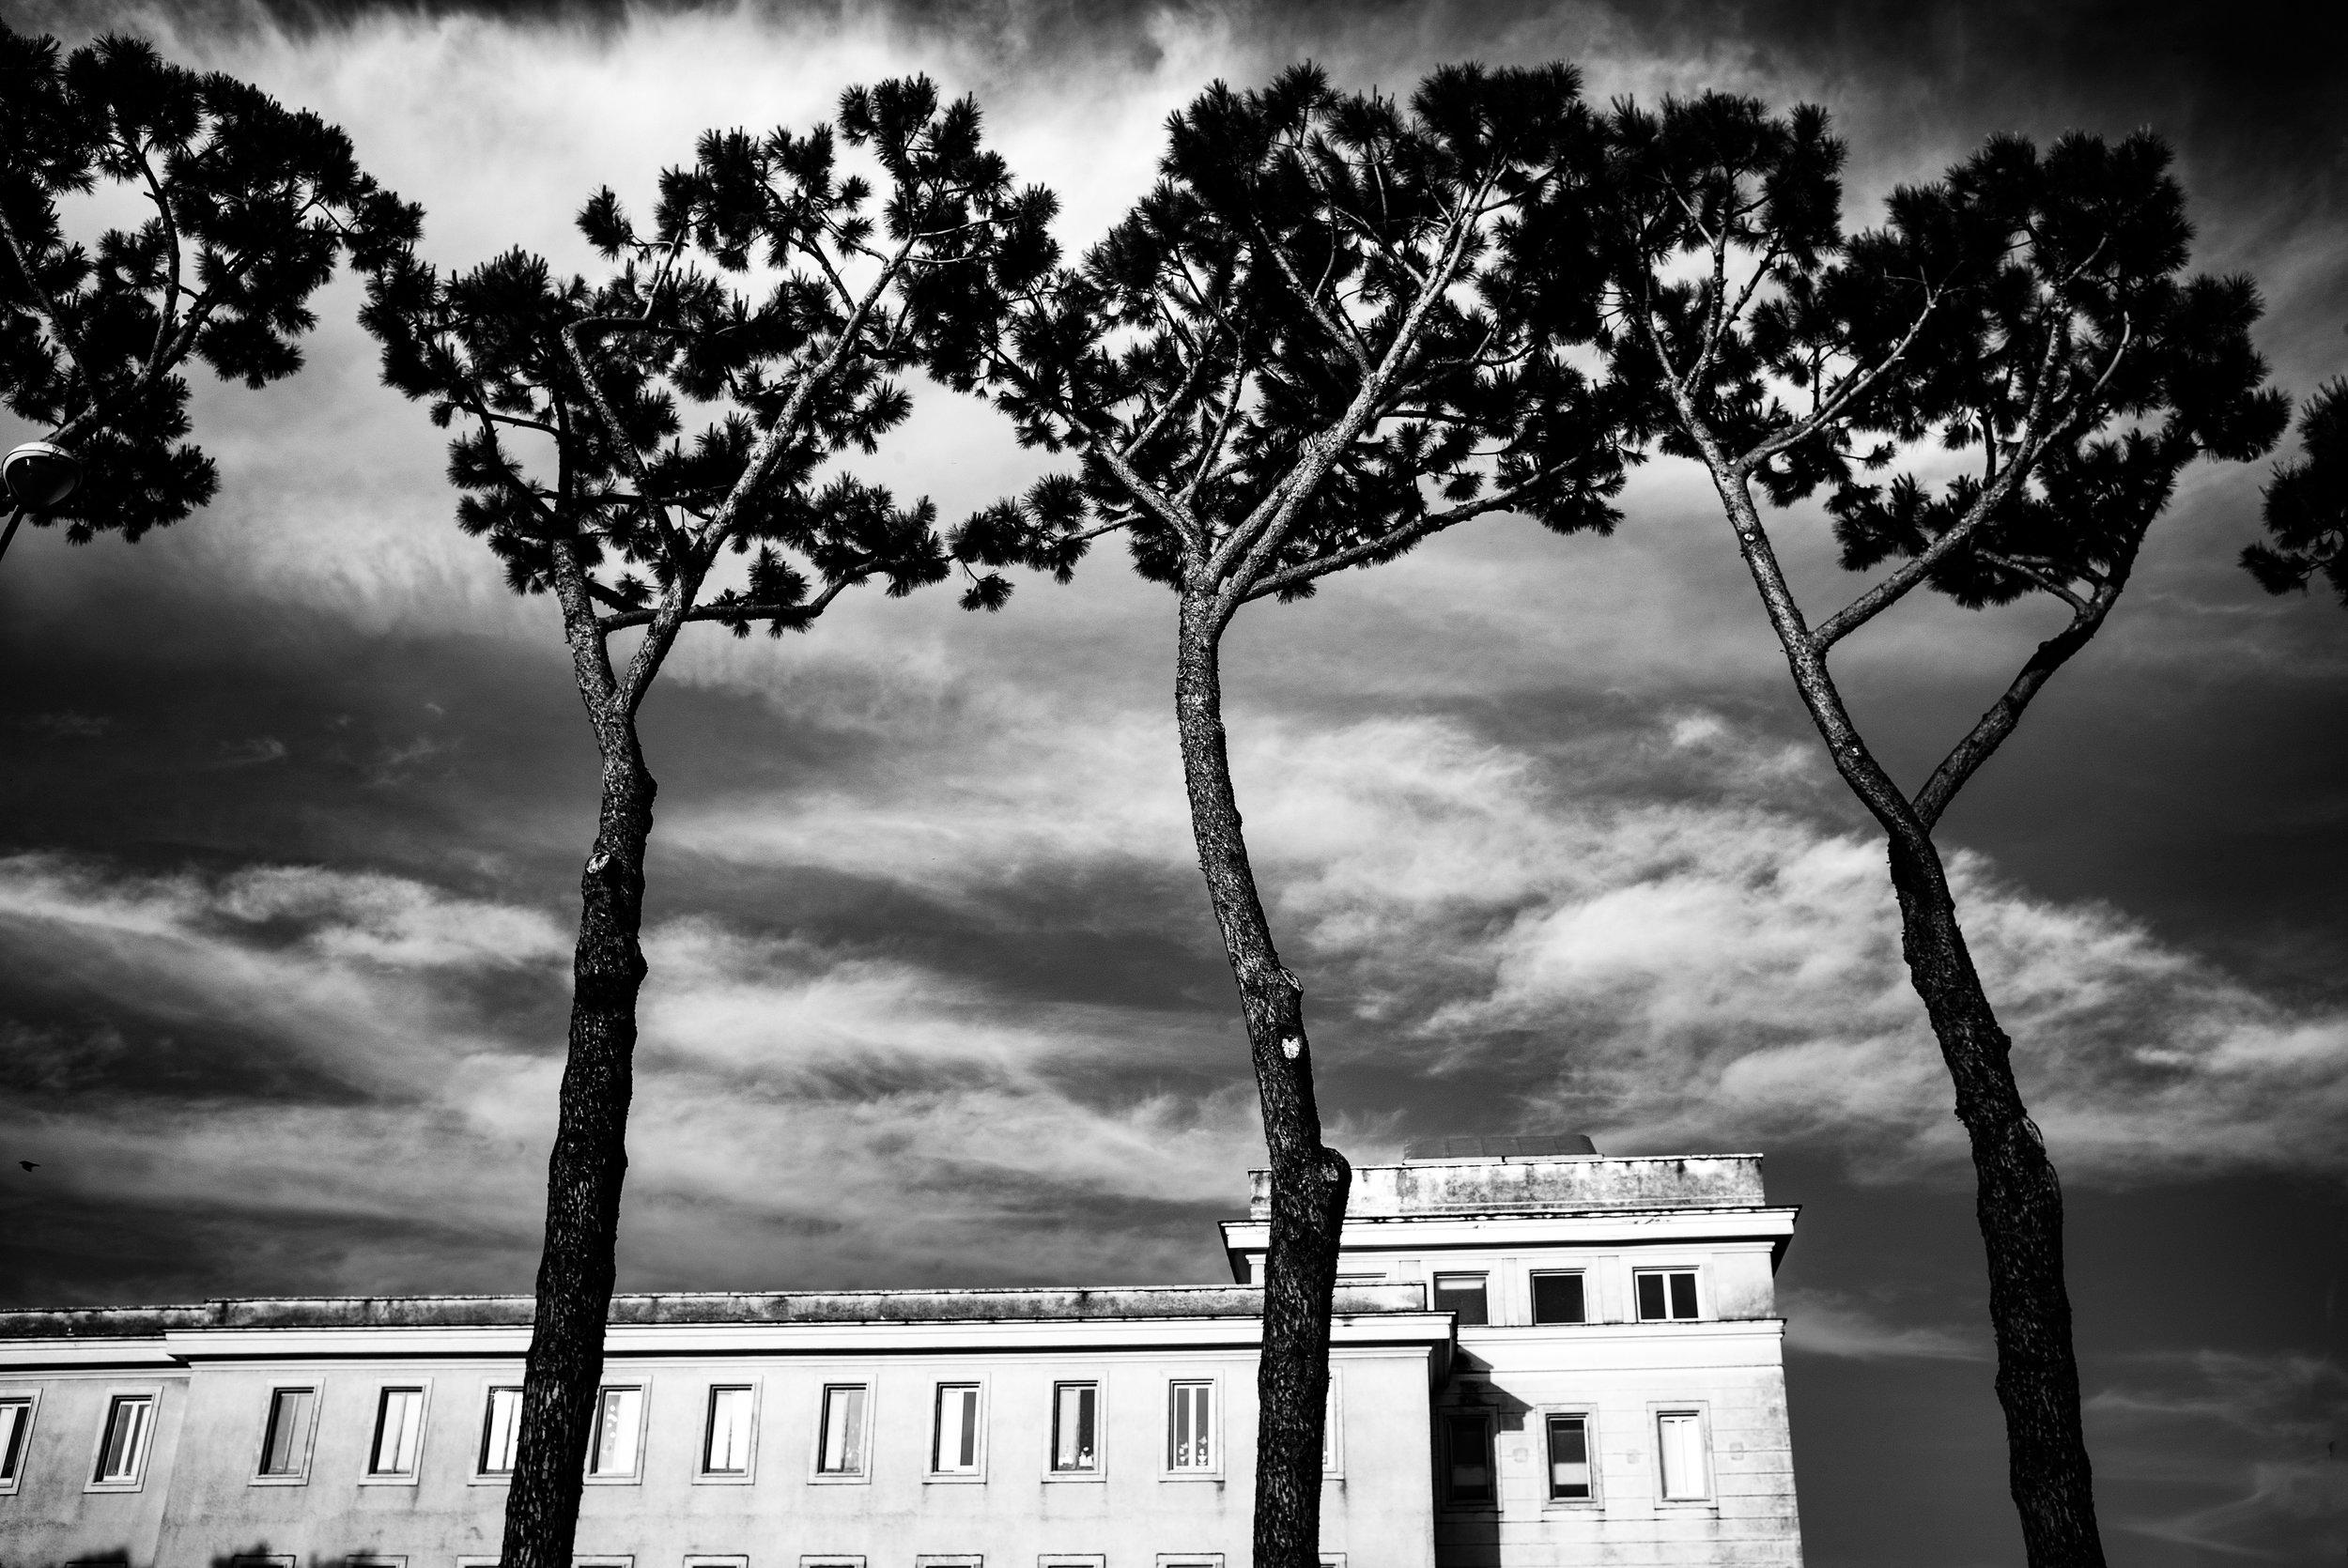 Pompei by Nadja Gusenbauer